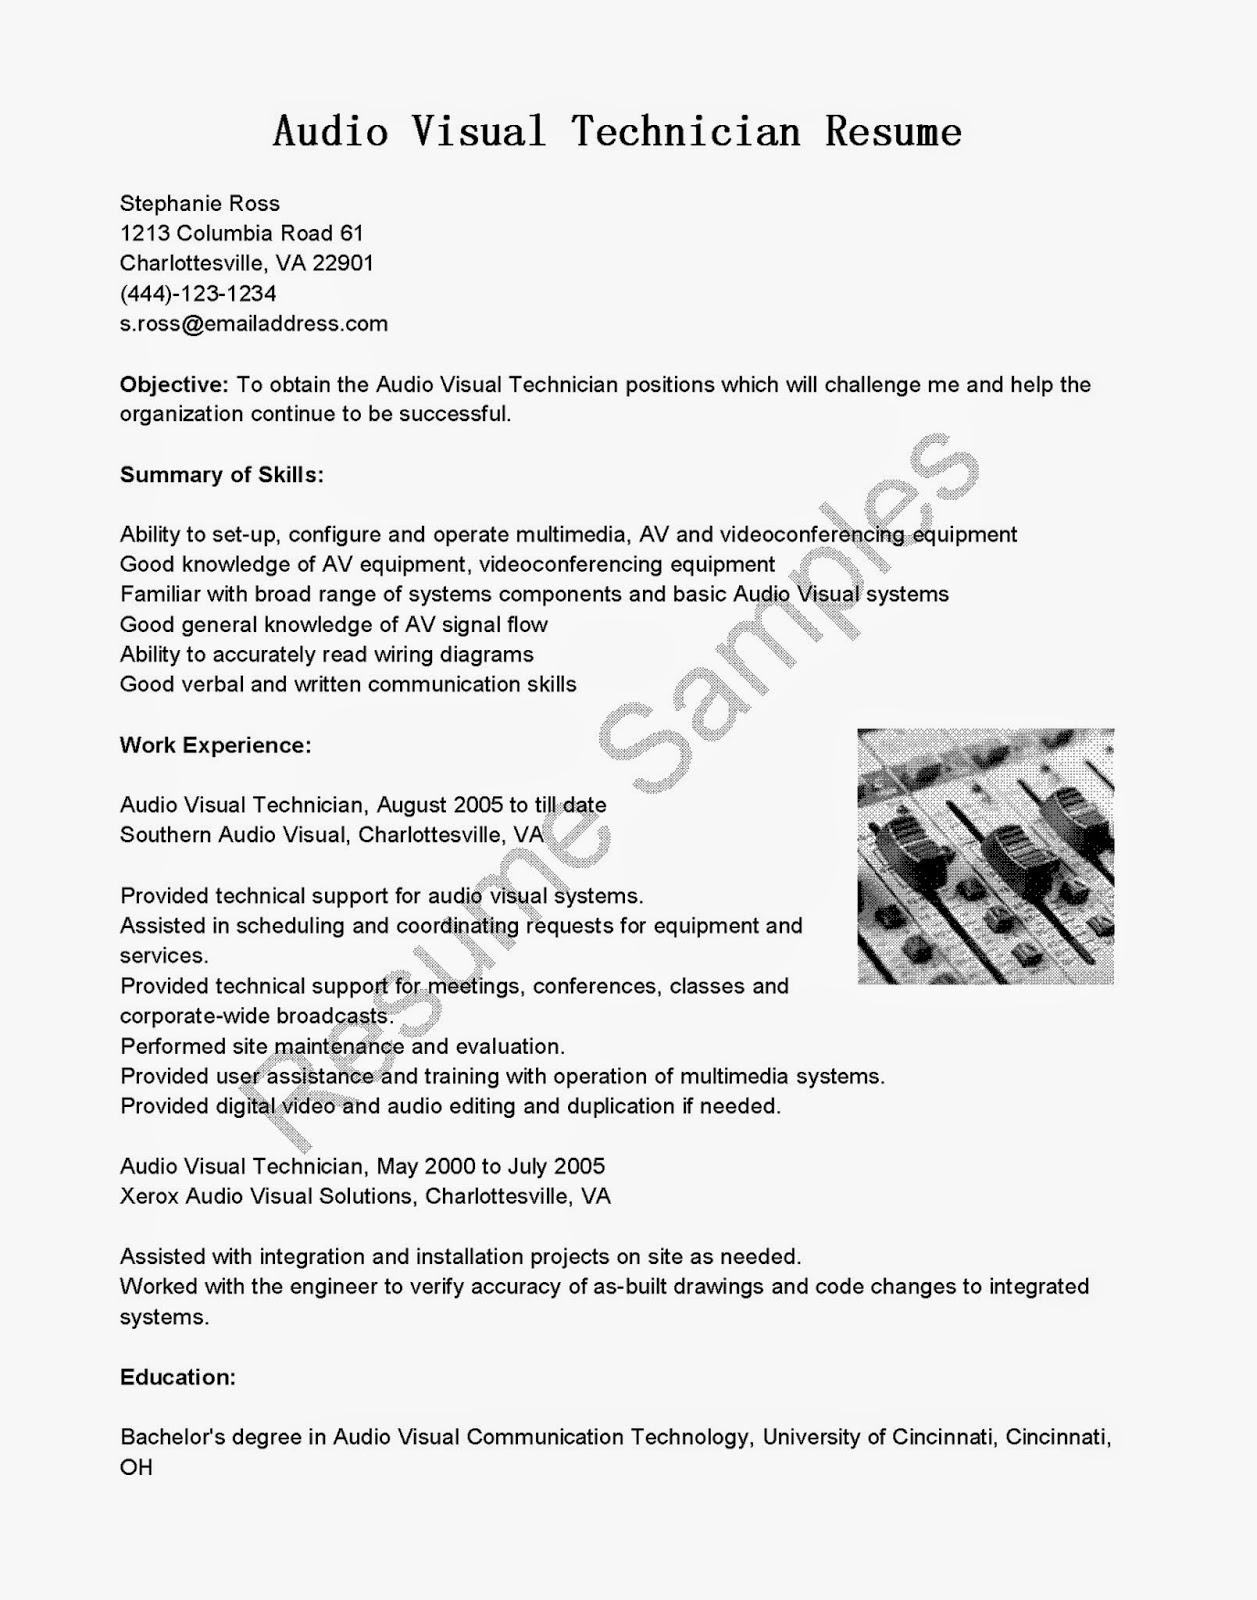 Resume Samples Audio Visual Technician Resume Sample